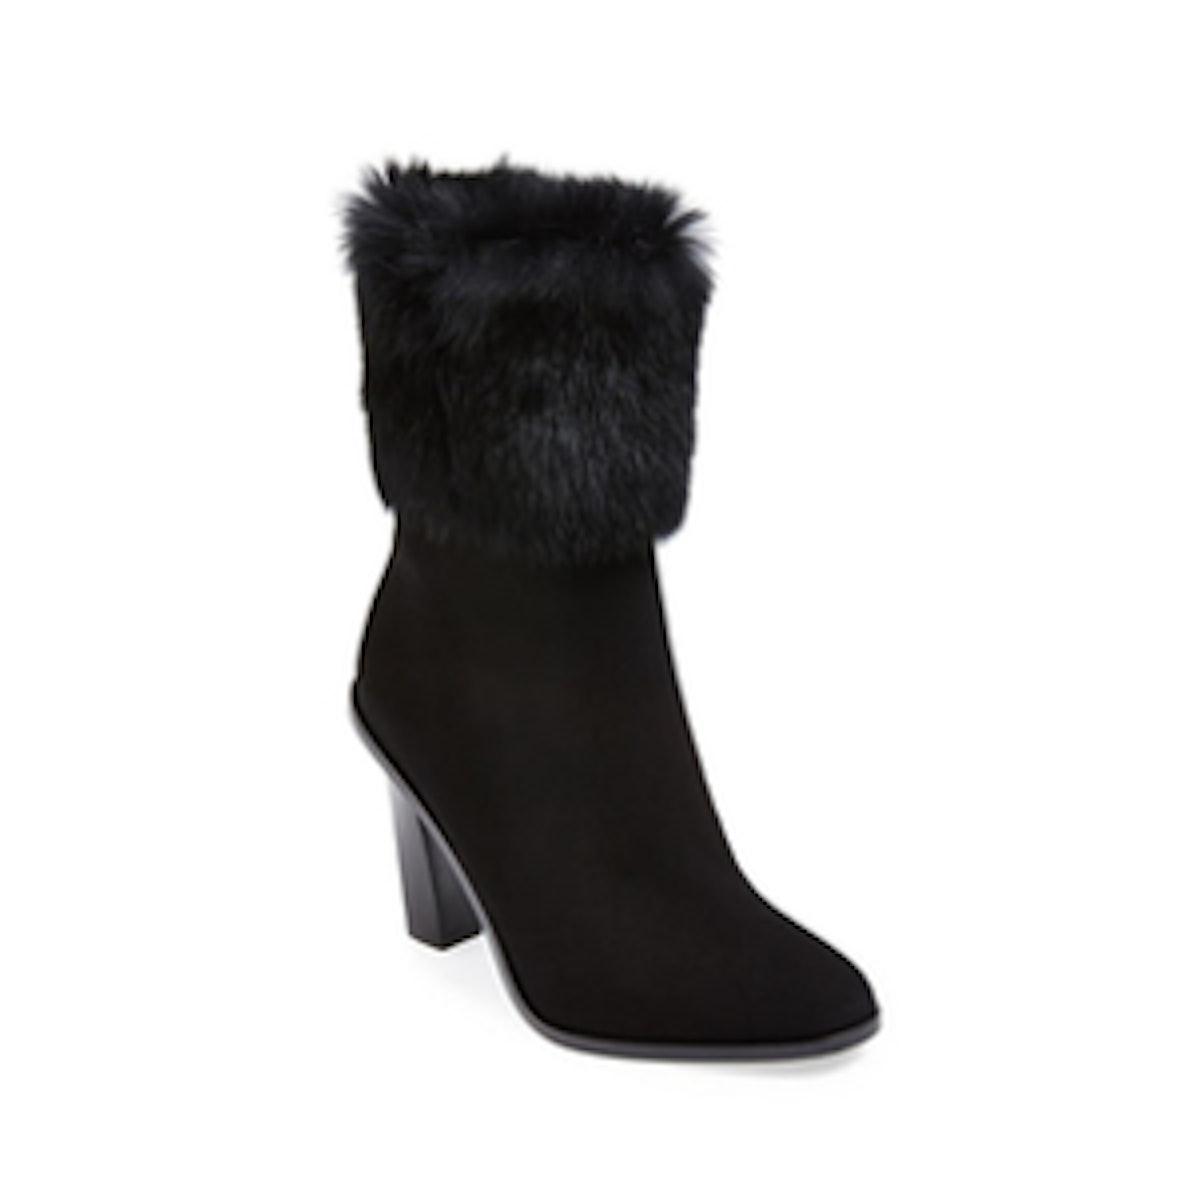 Fur Trimmed Boots